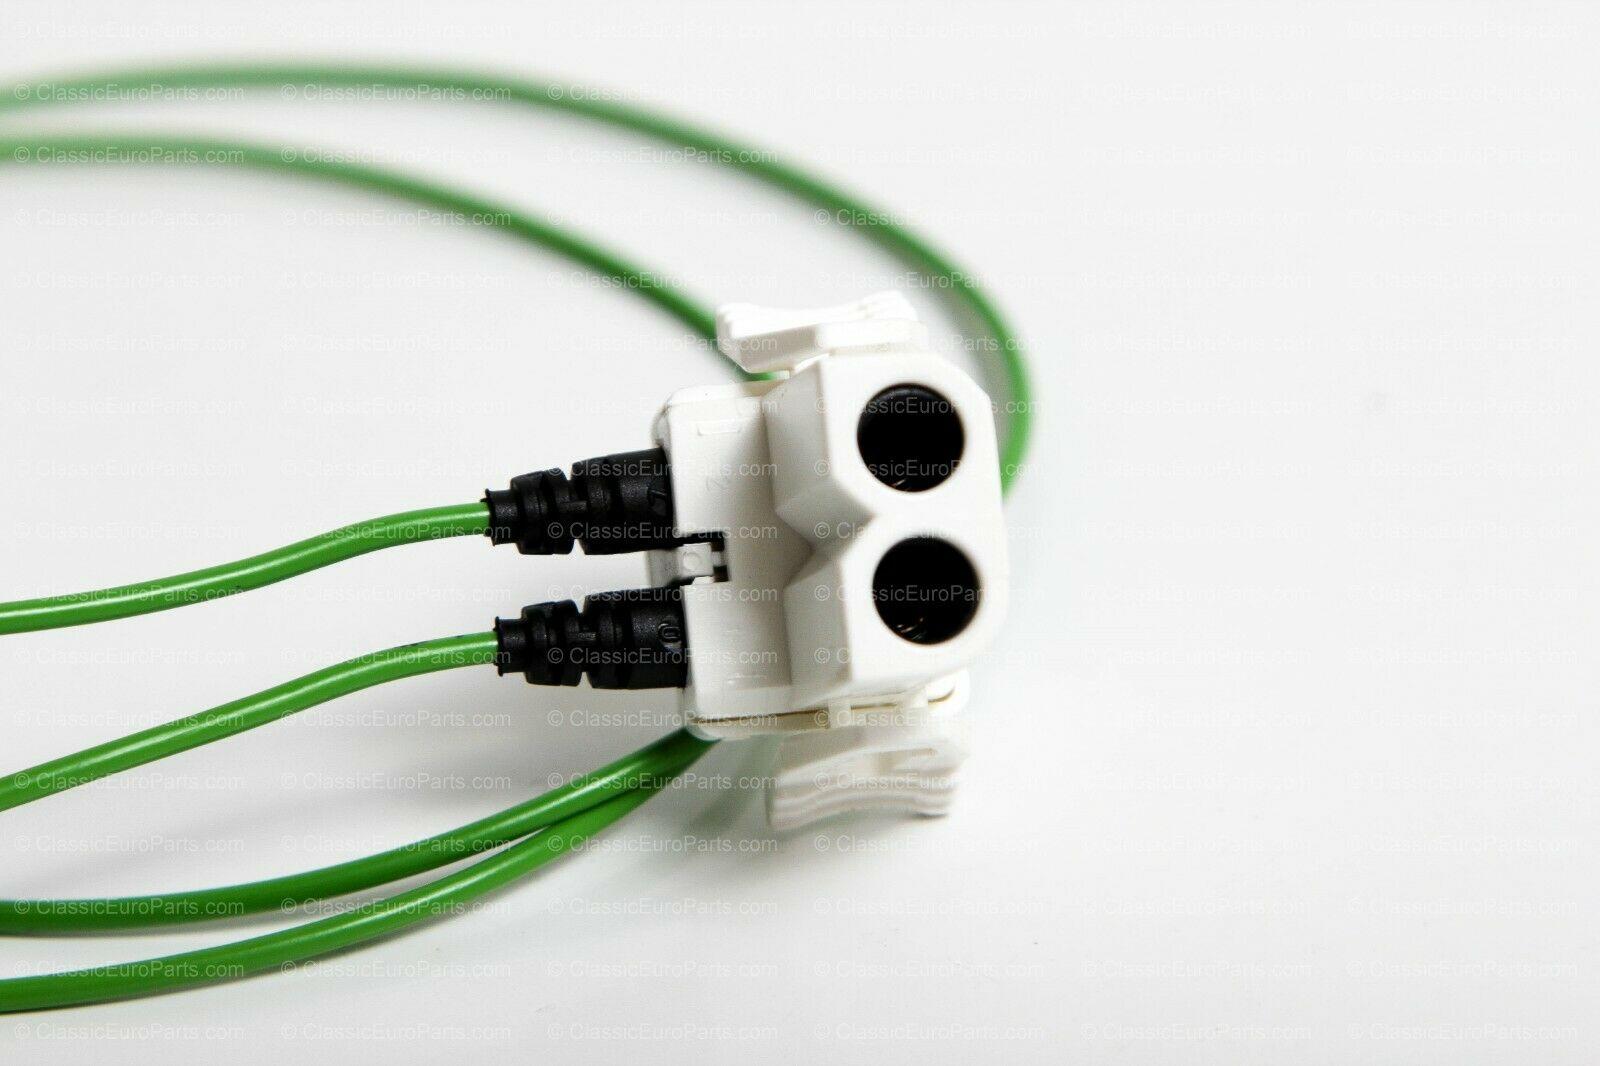 euro ellipsoid / smiley headlight connectors for e30 – classiceuroparts  classiceuroparts